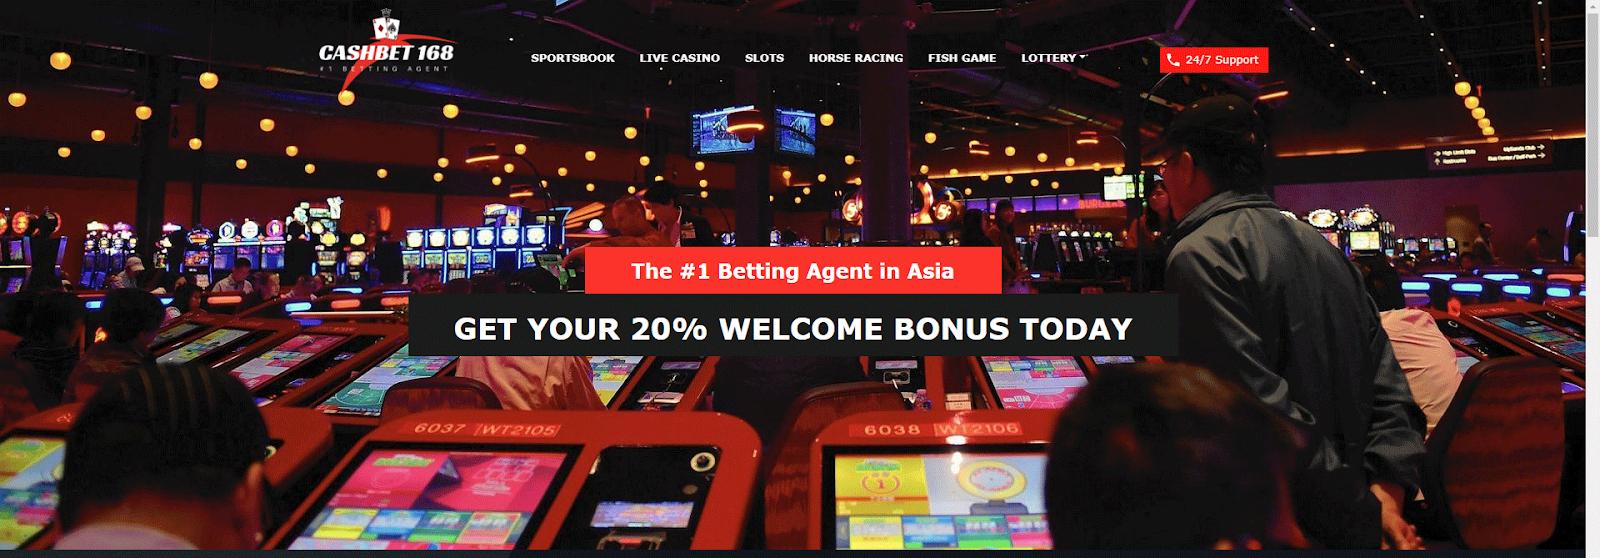 Cashbet168 online casino Singapore